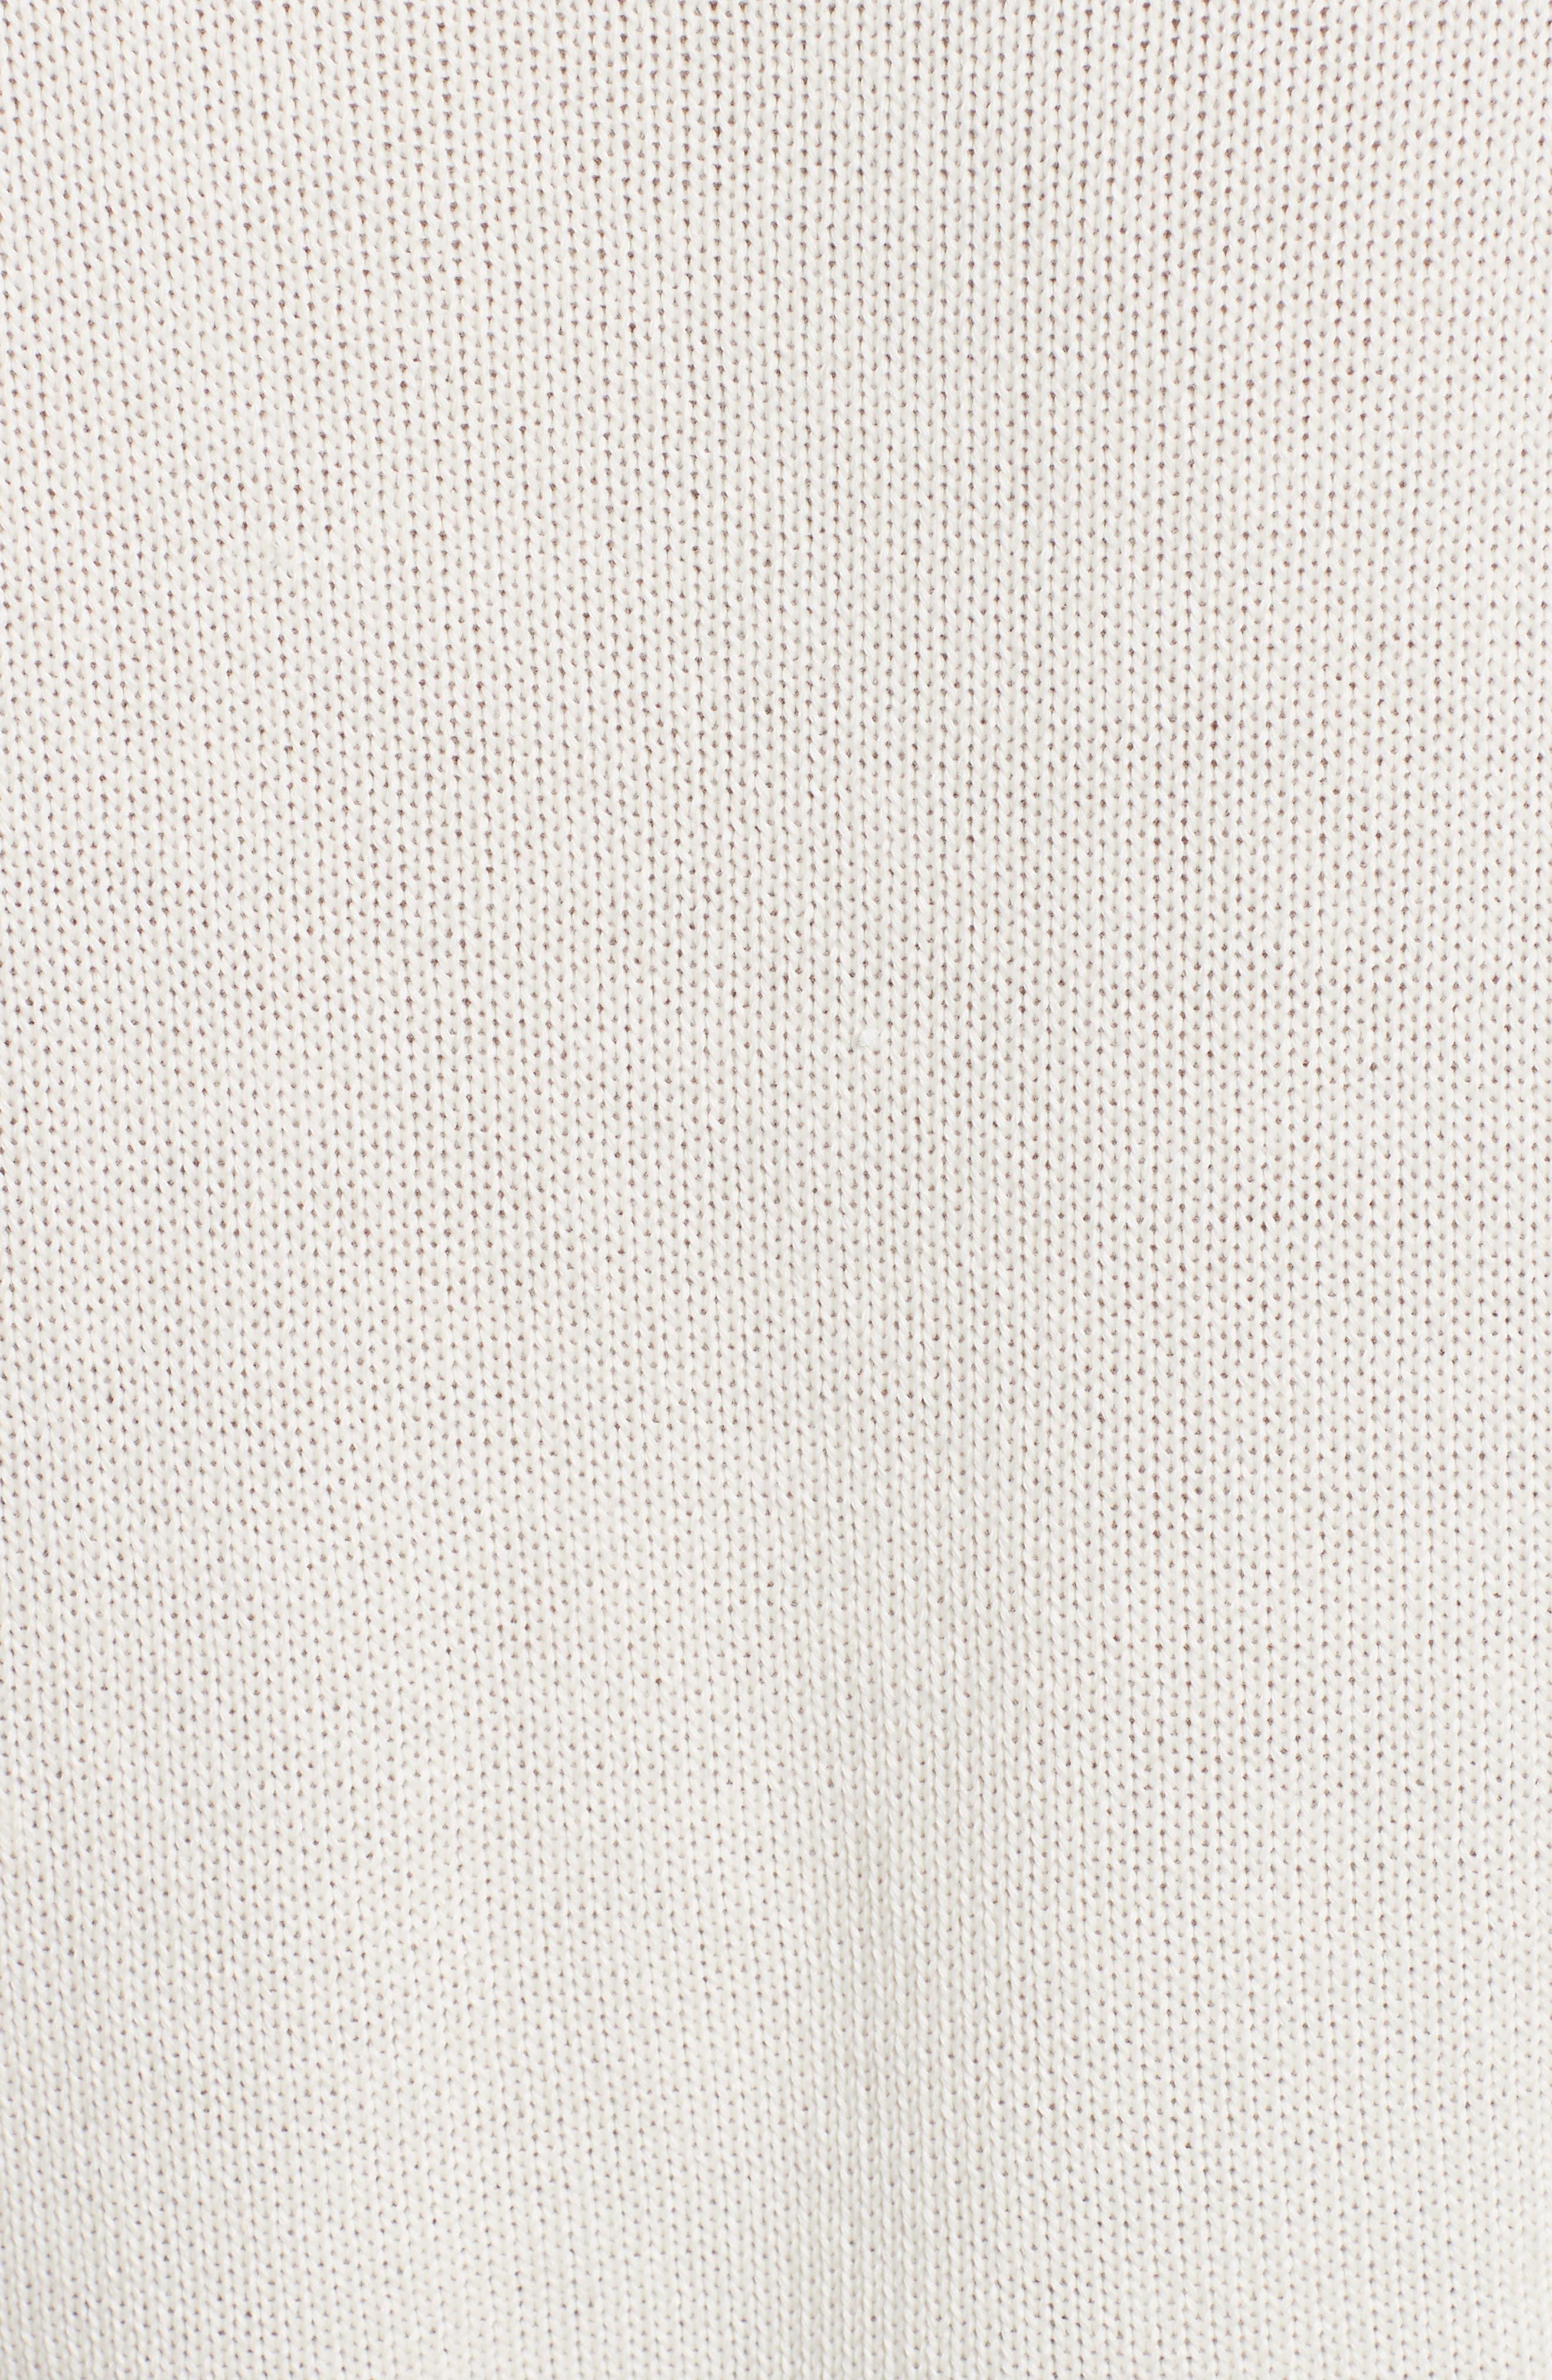 Alternate Image 3  - MARC JACOBS Rainbow Cotton Blend Sweater